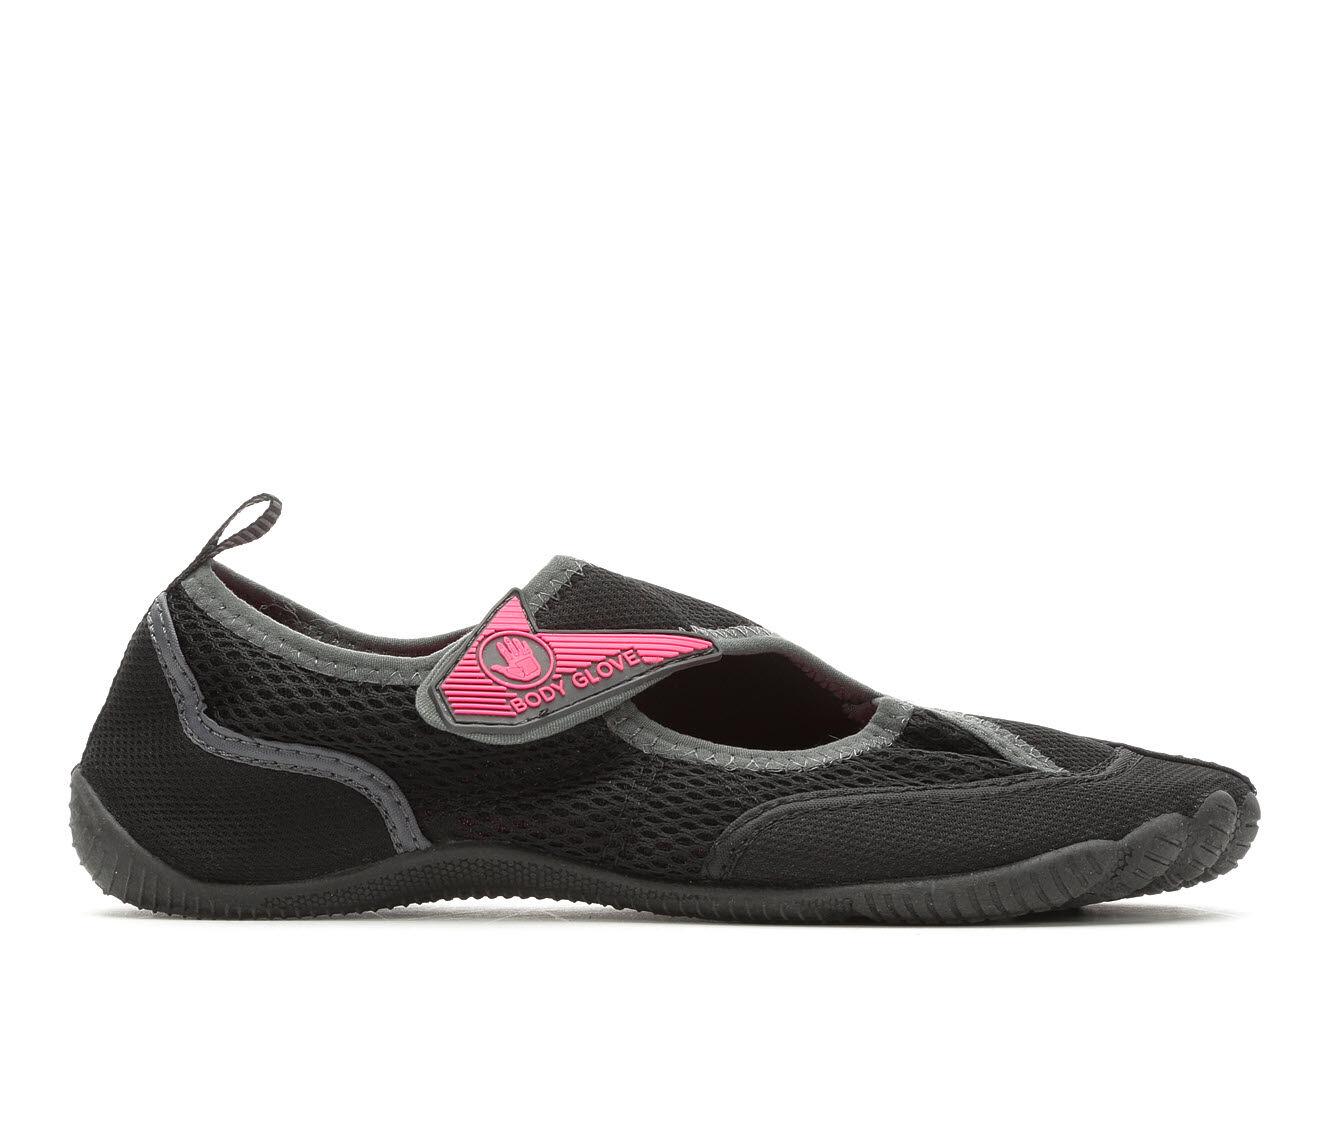 choose authentic Women's Body Glove Horizon Water Shoes Black/Black